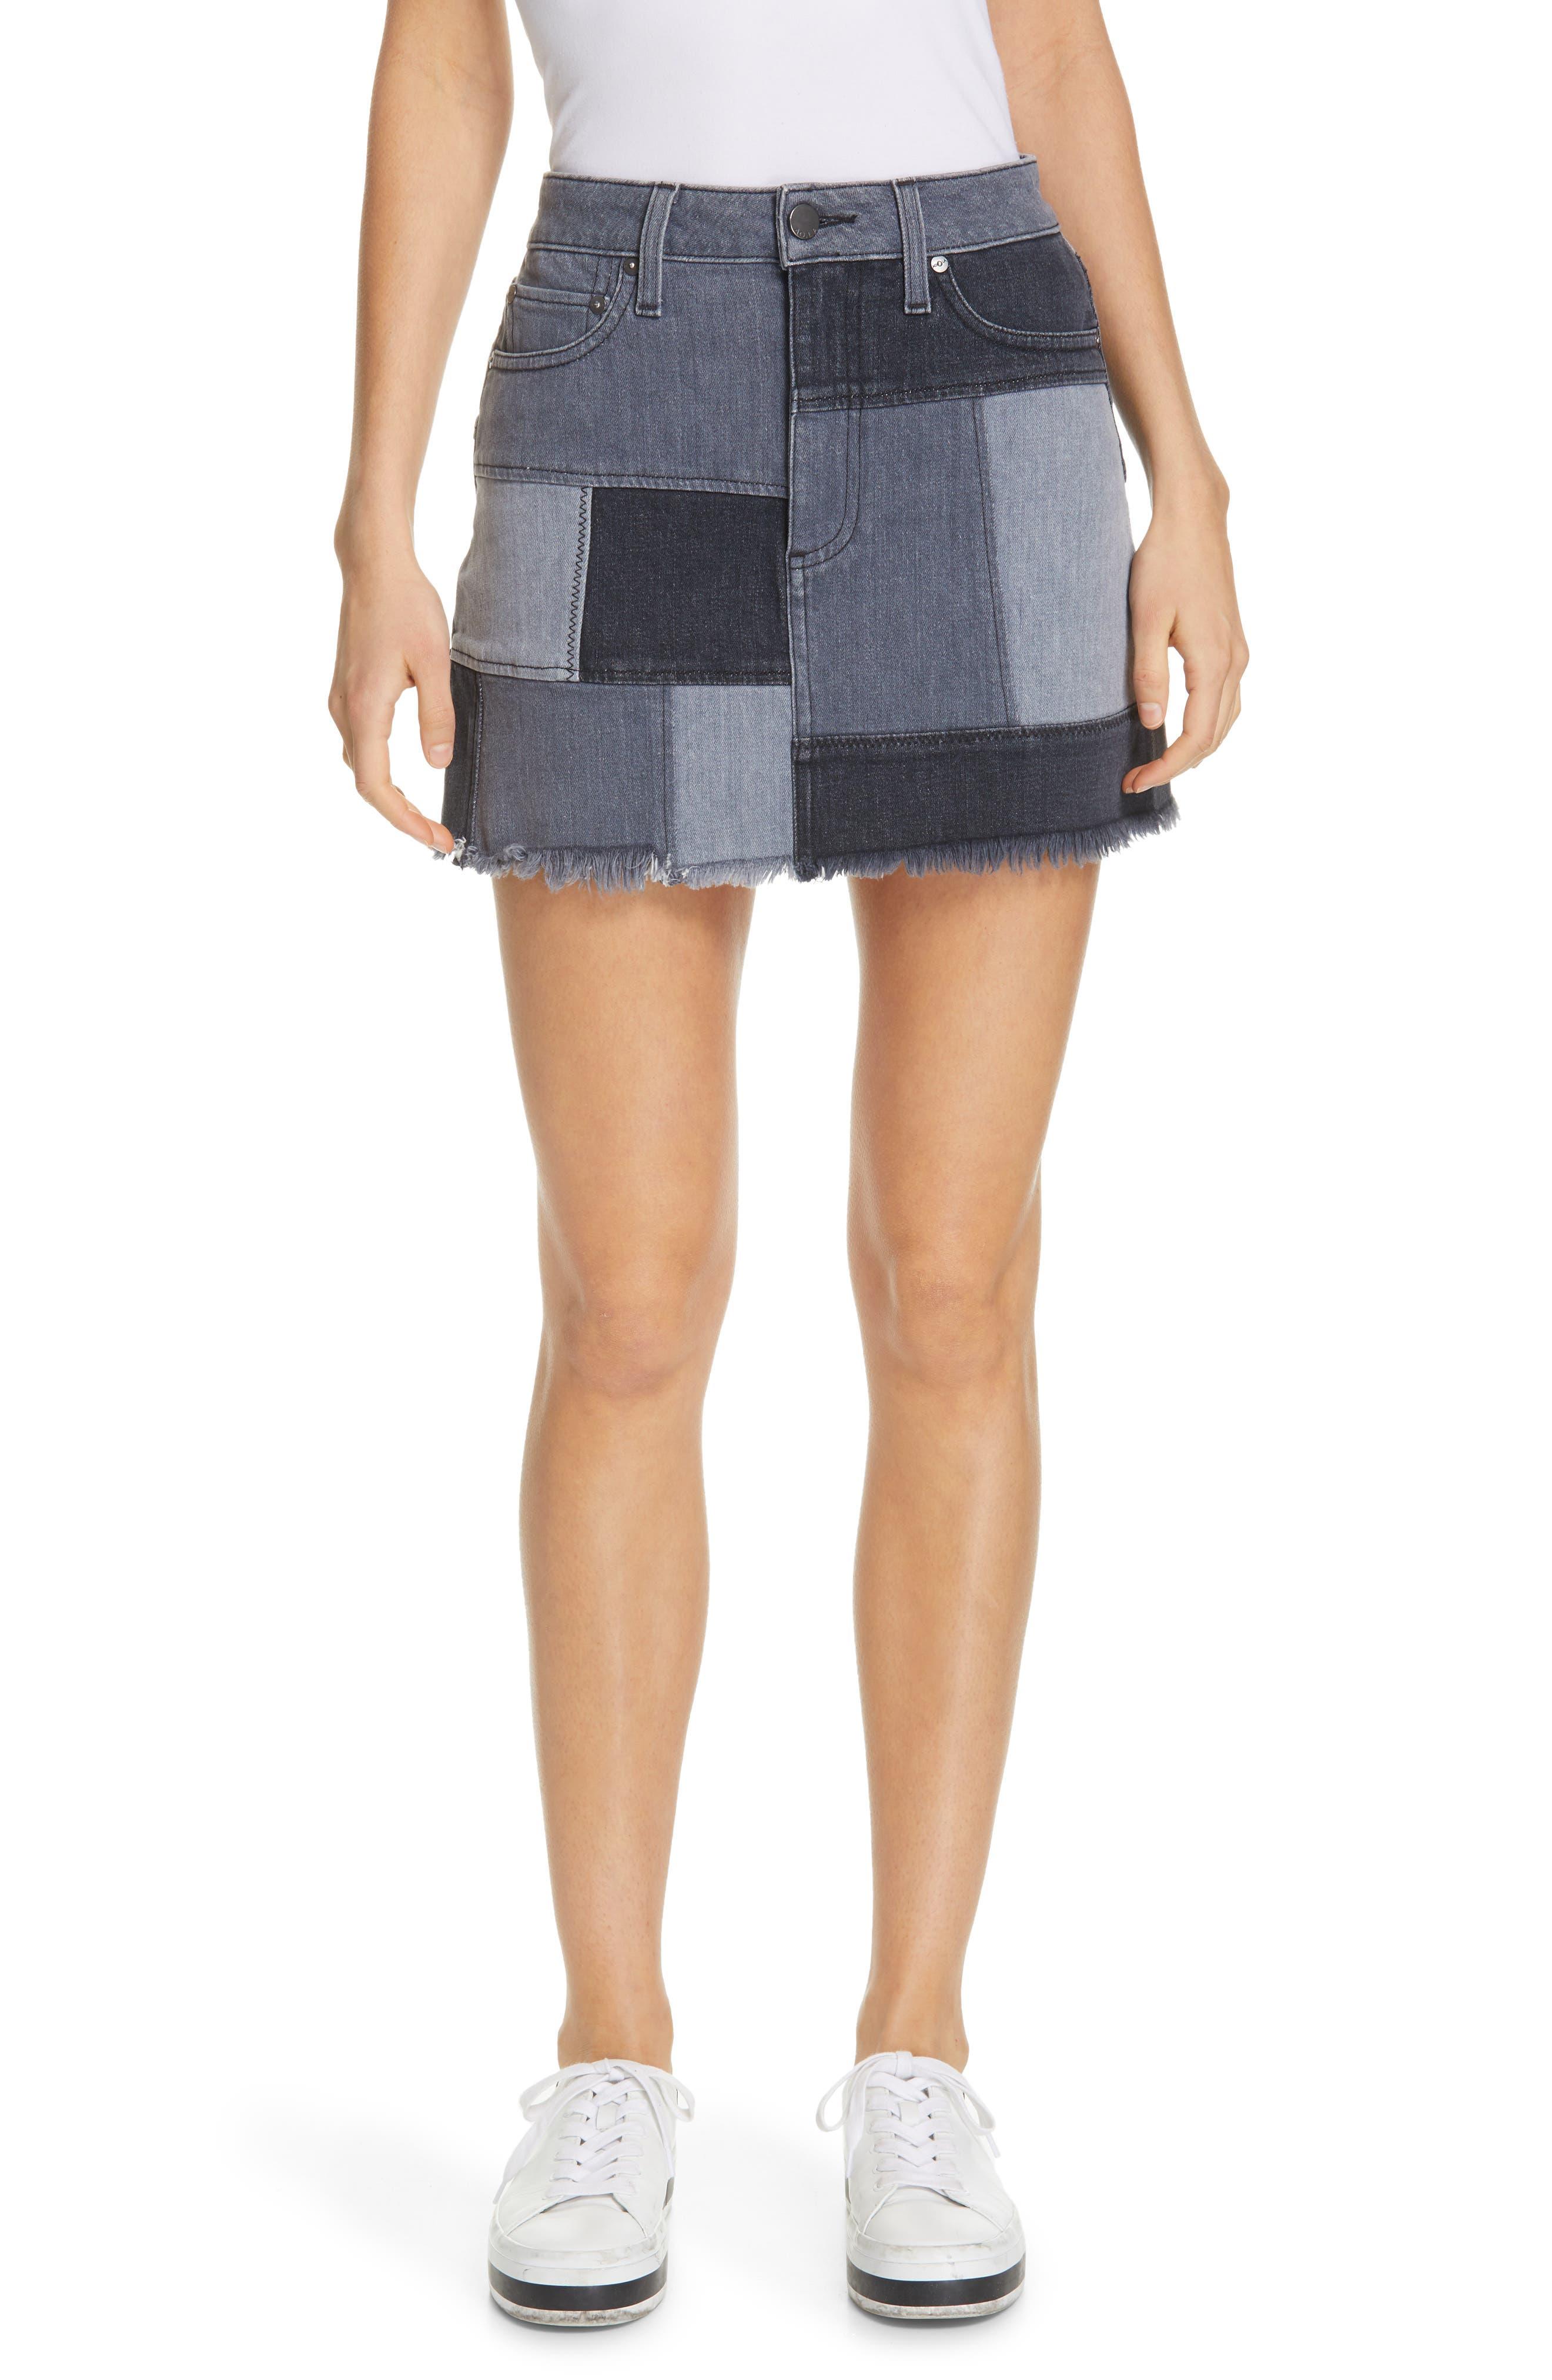 ALICE + OLIVIA JEANS Amazing Patchwork Denim Miniskirt, Main, color, NIGHT SKY